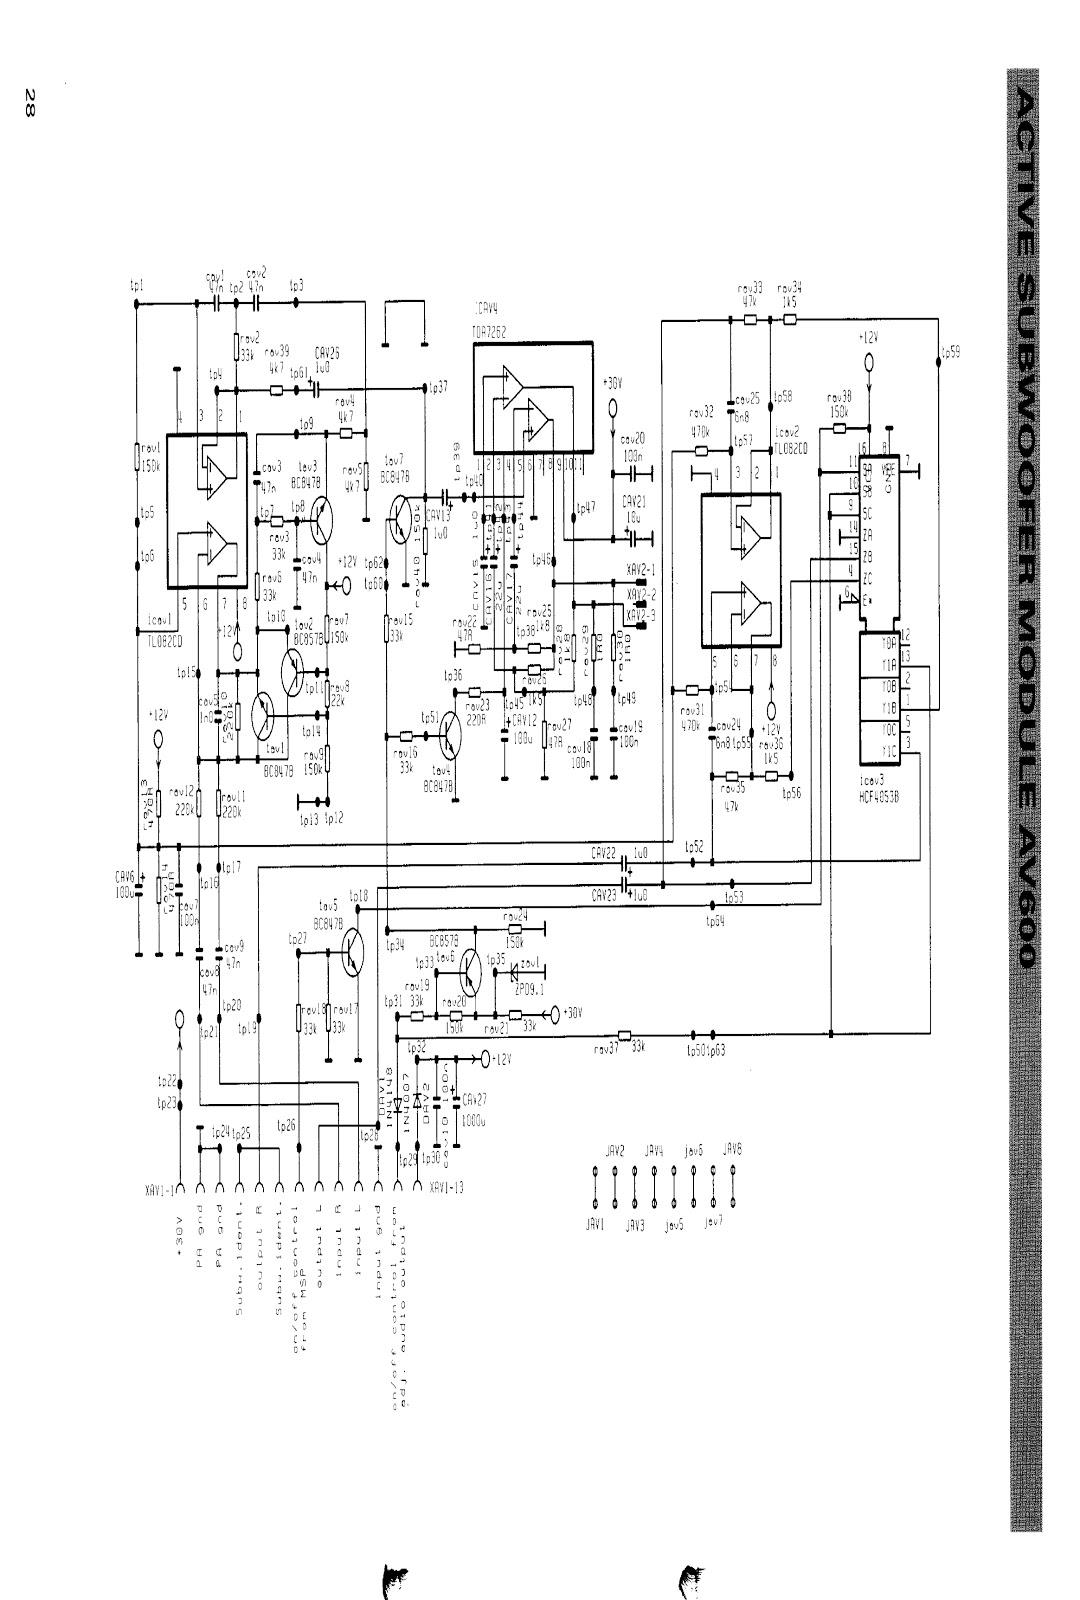 firetrol battery charger ll 1580 wiring diagram